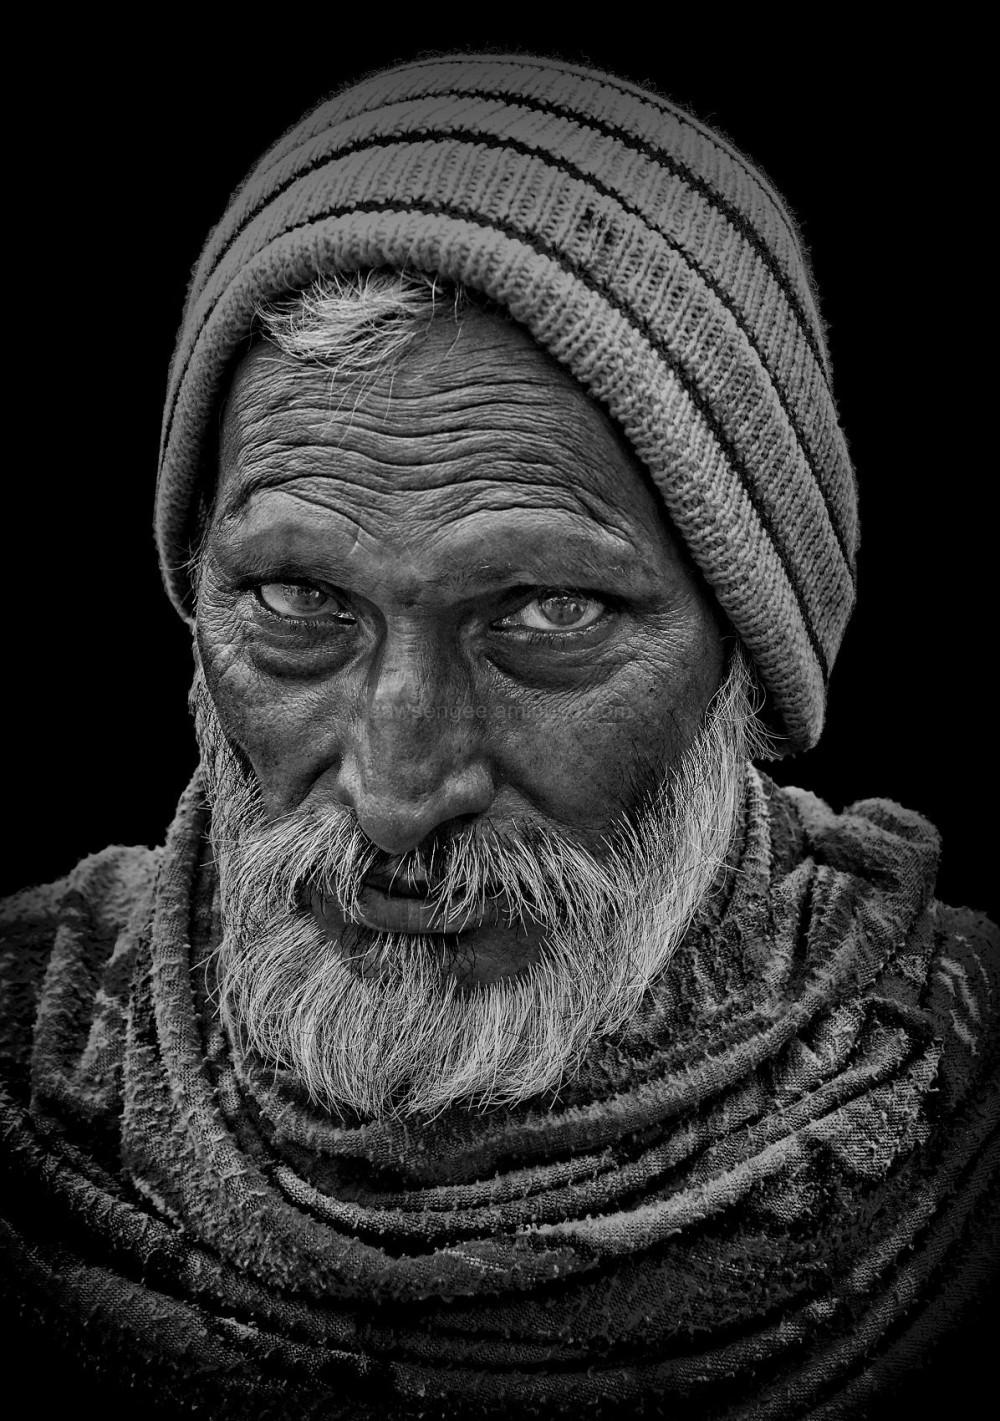 street monochrome natural light portrait Haridwar